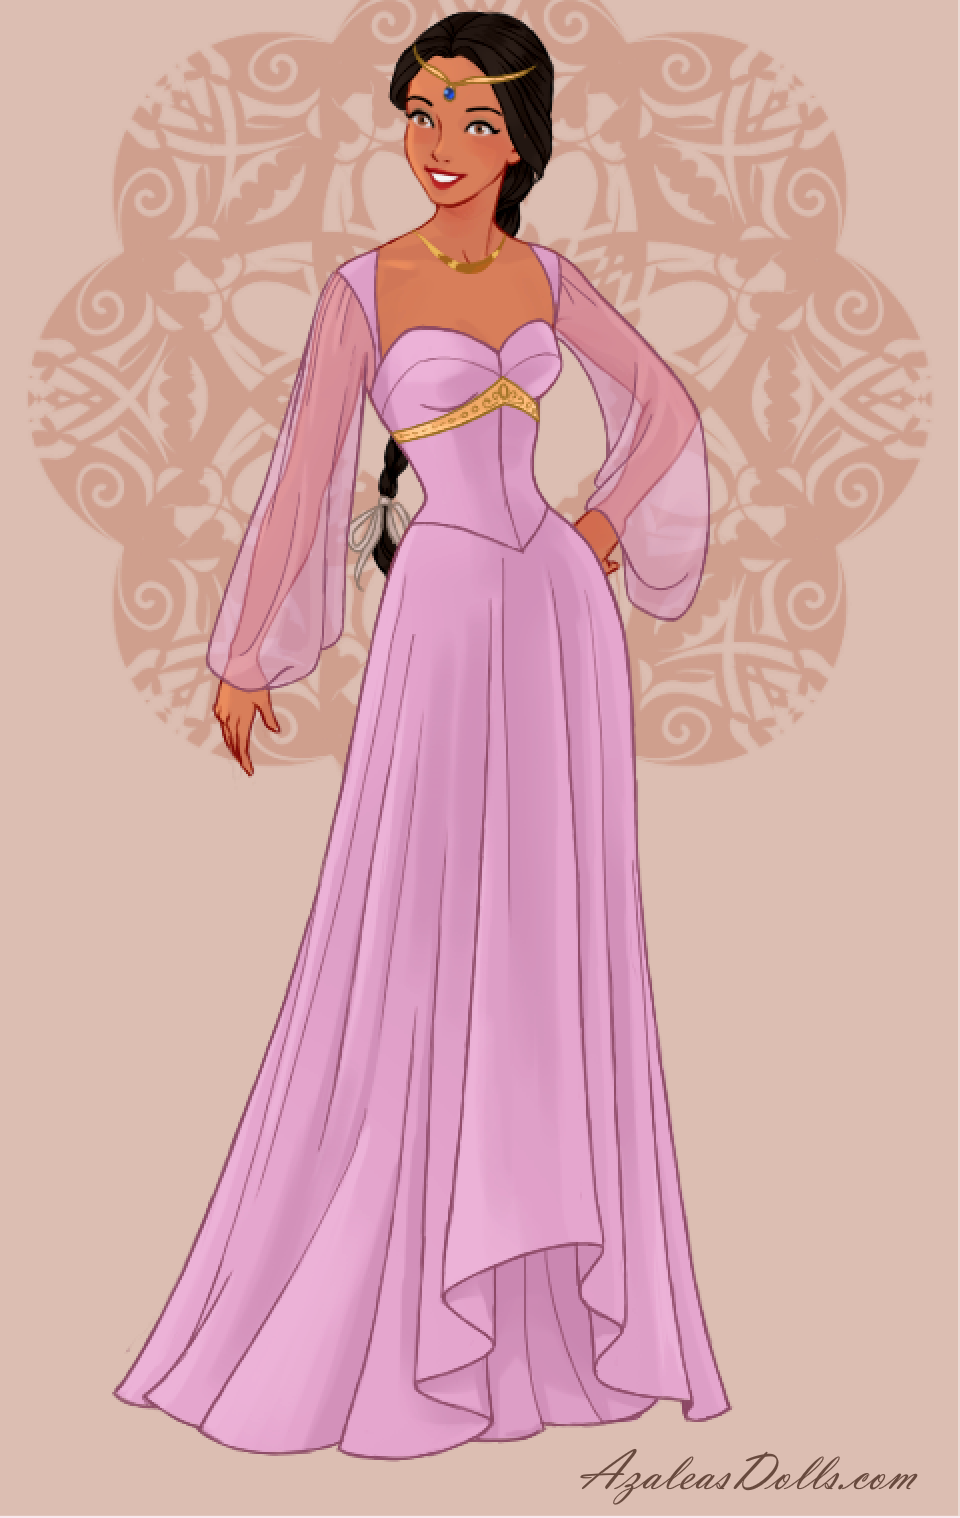 Princess Jasmine In Wedding Dress Design Dress Up Game Princess Jasmine Designer Wedding Dresses Princess [ 1518 x 960 Pixel ]